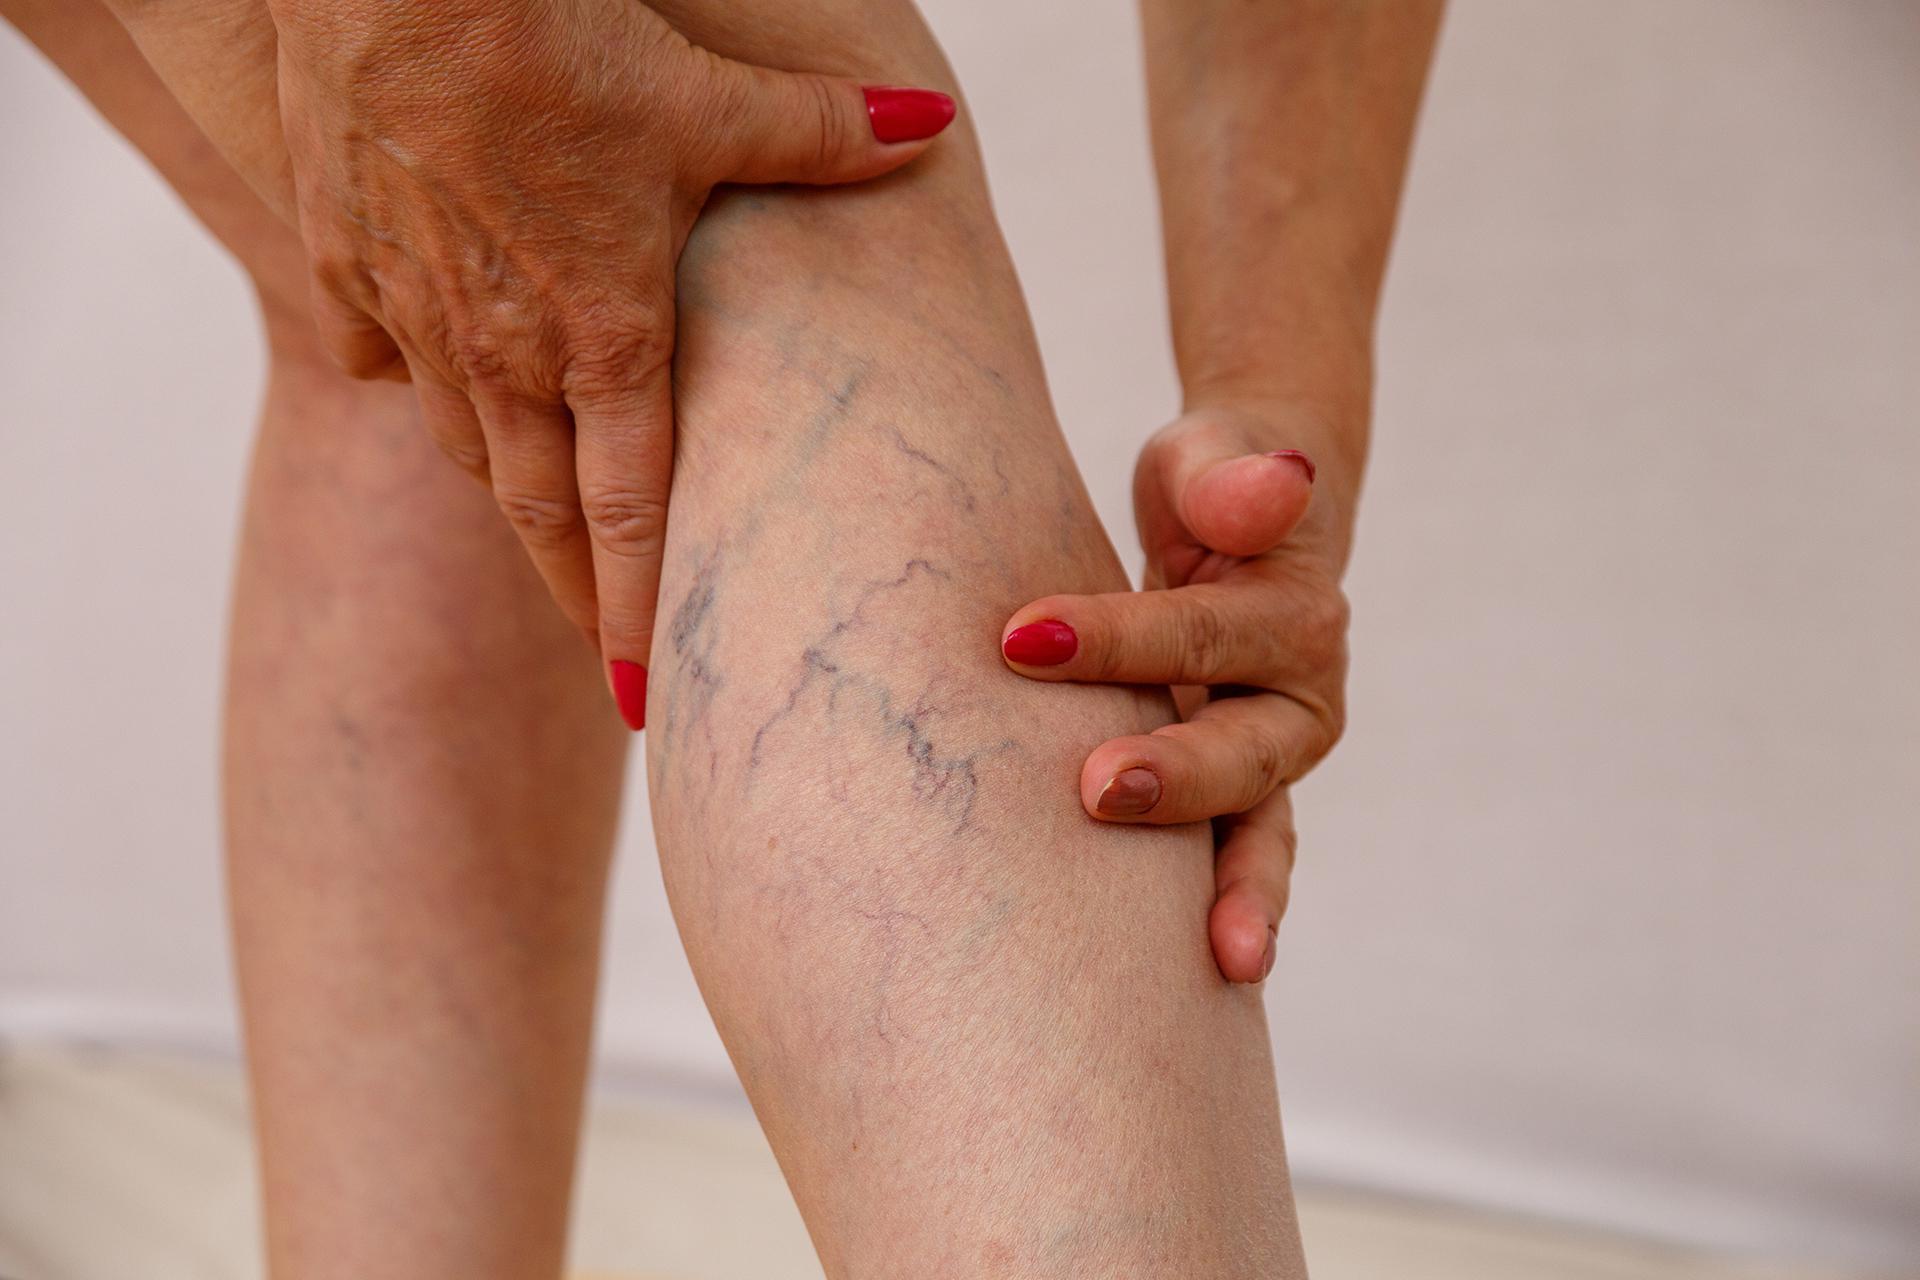 vascular-issues-requiring-leg-pain-doctor-Rancho-Palos-Verdes